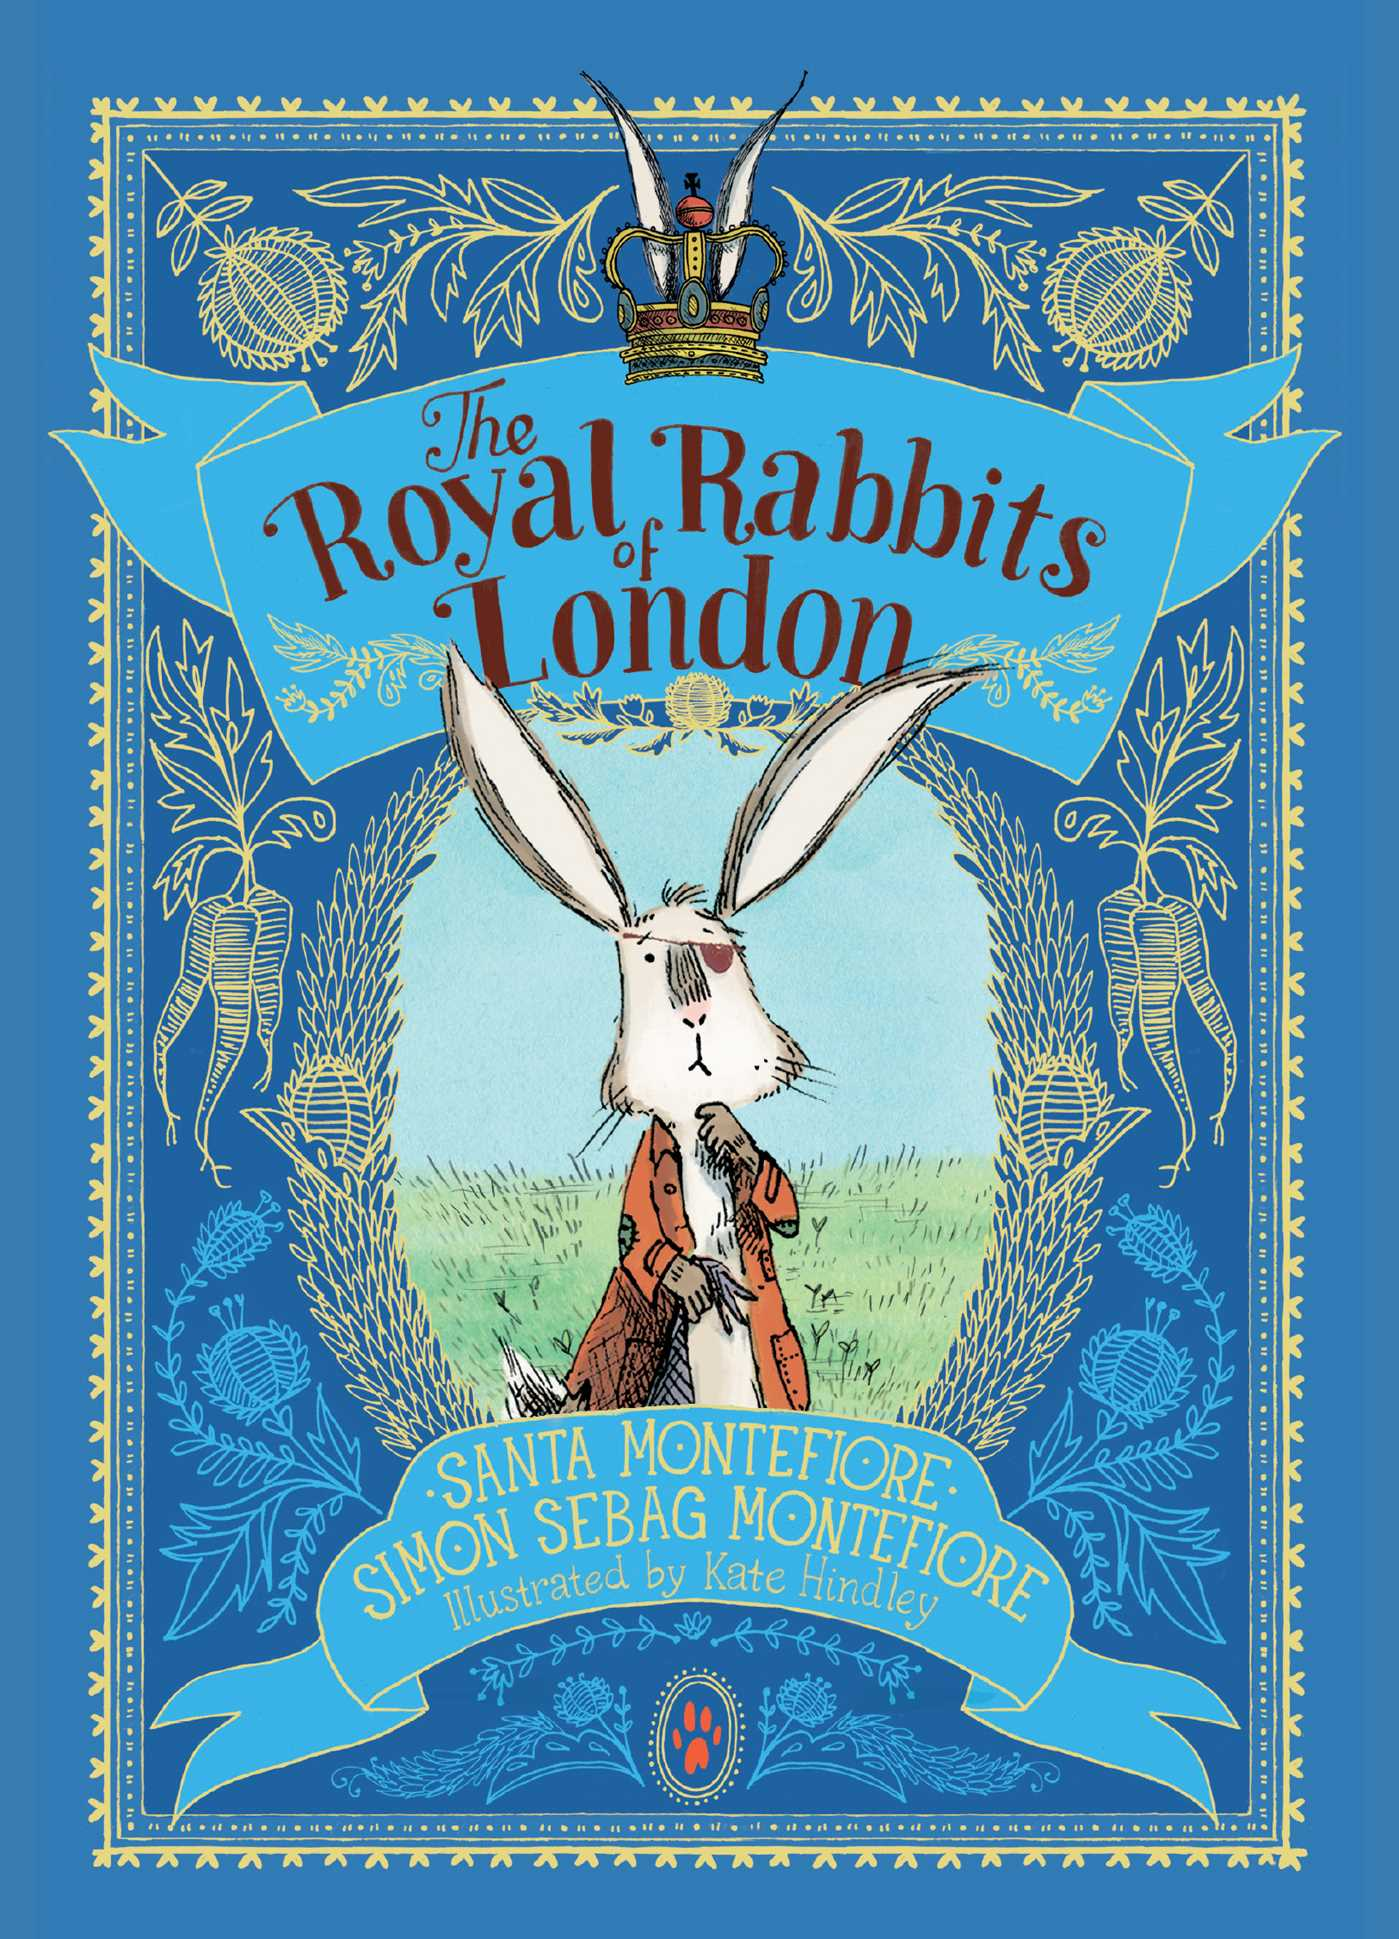 The royal rabbits of london 9781481498609 hr